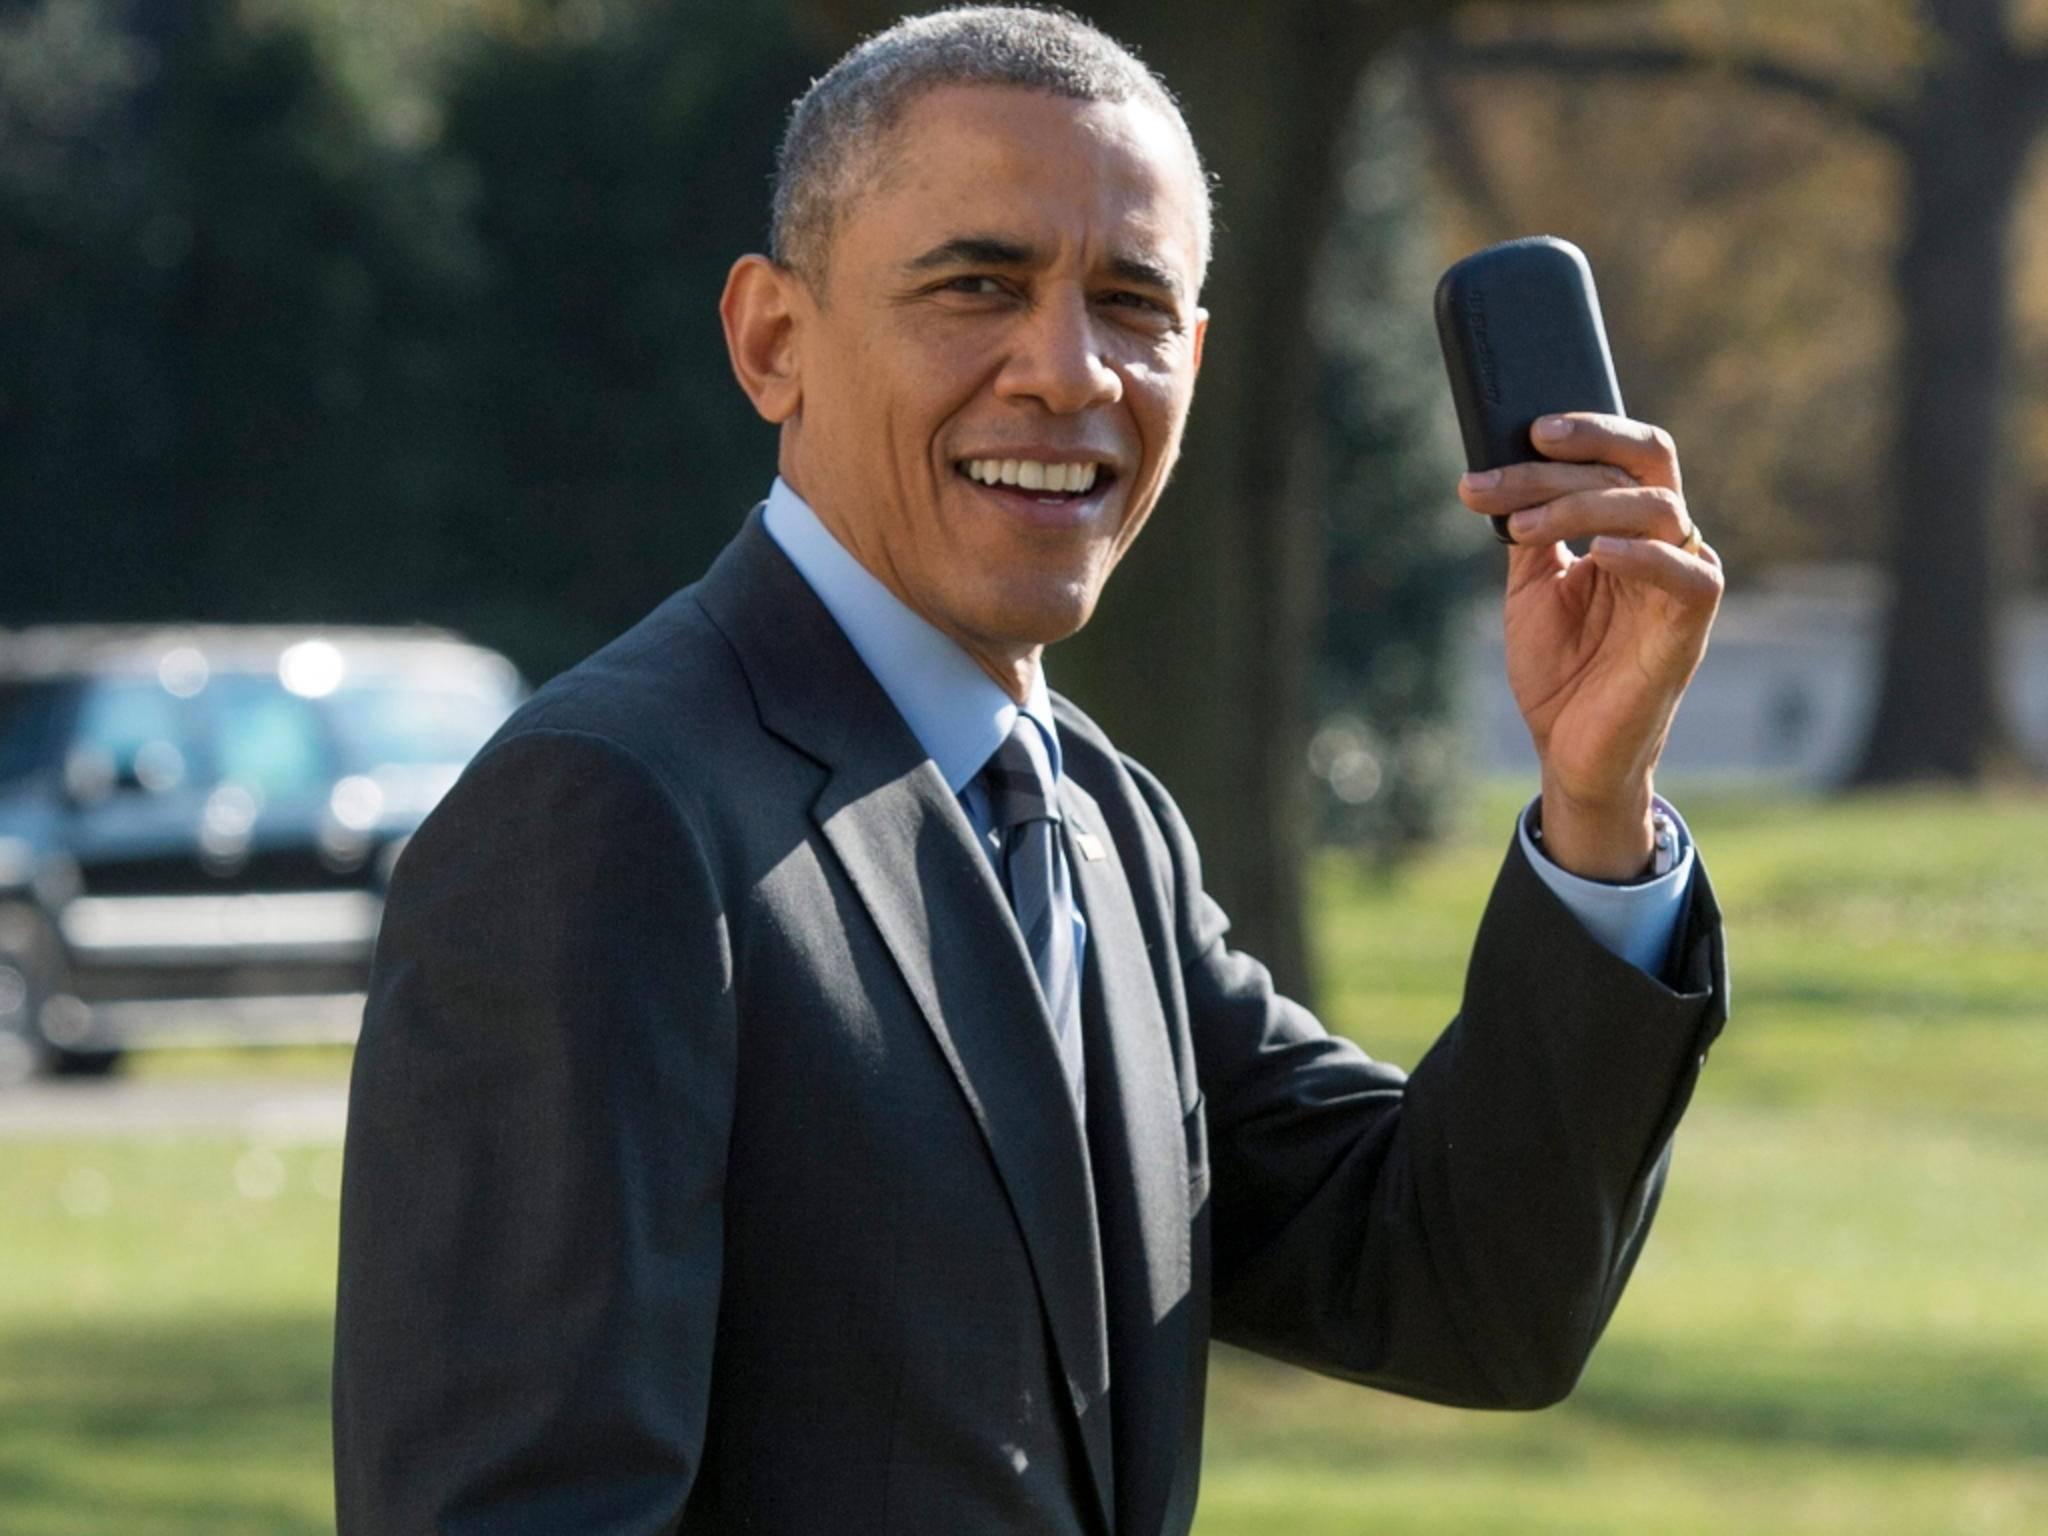 US-Präsident Barack Obama mit seinem BlackBerry.